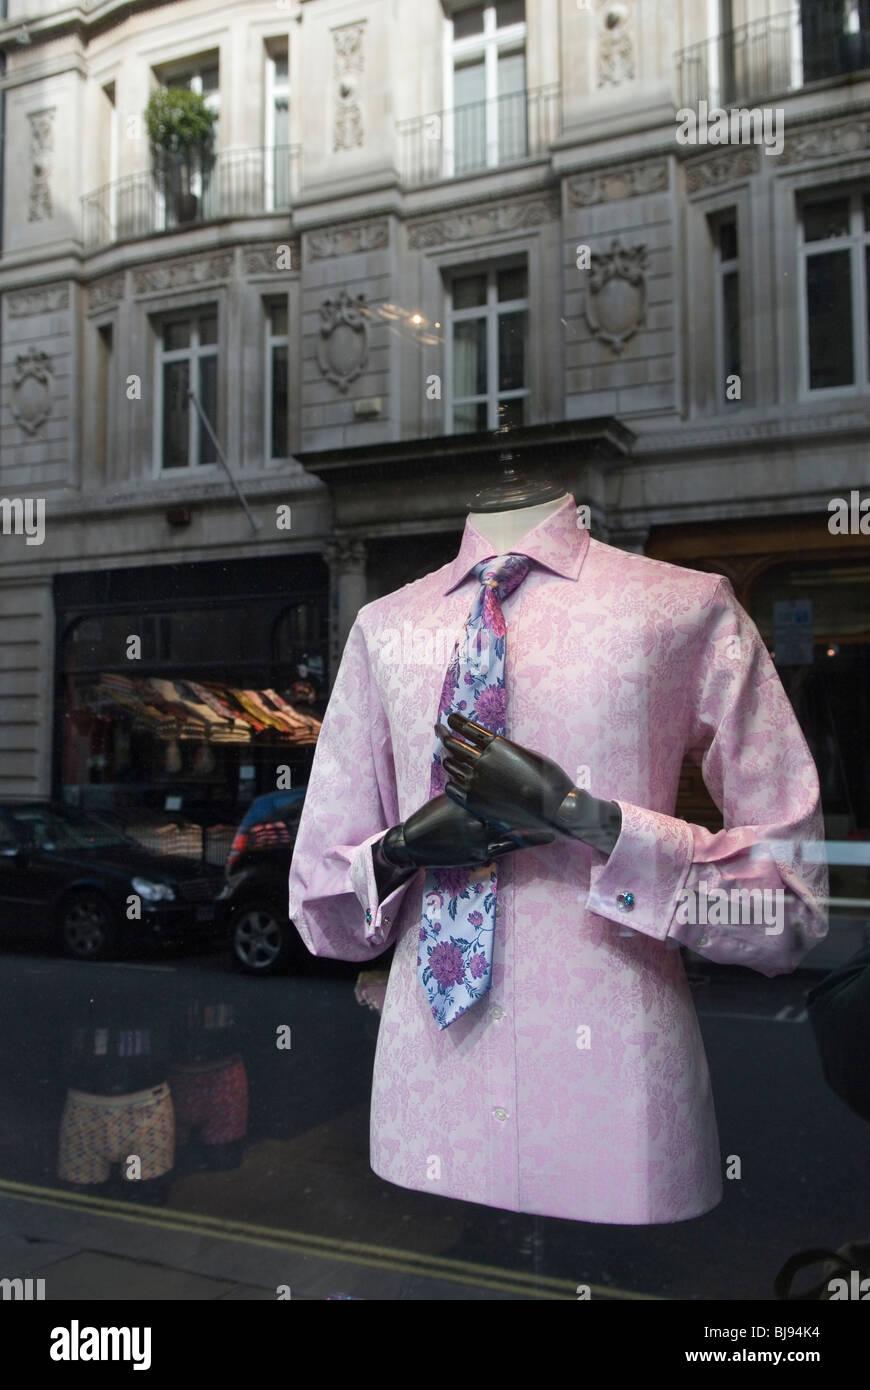 Jermyn Street London W1 Uk. Traditional mens clothing store. - Stock Image